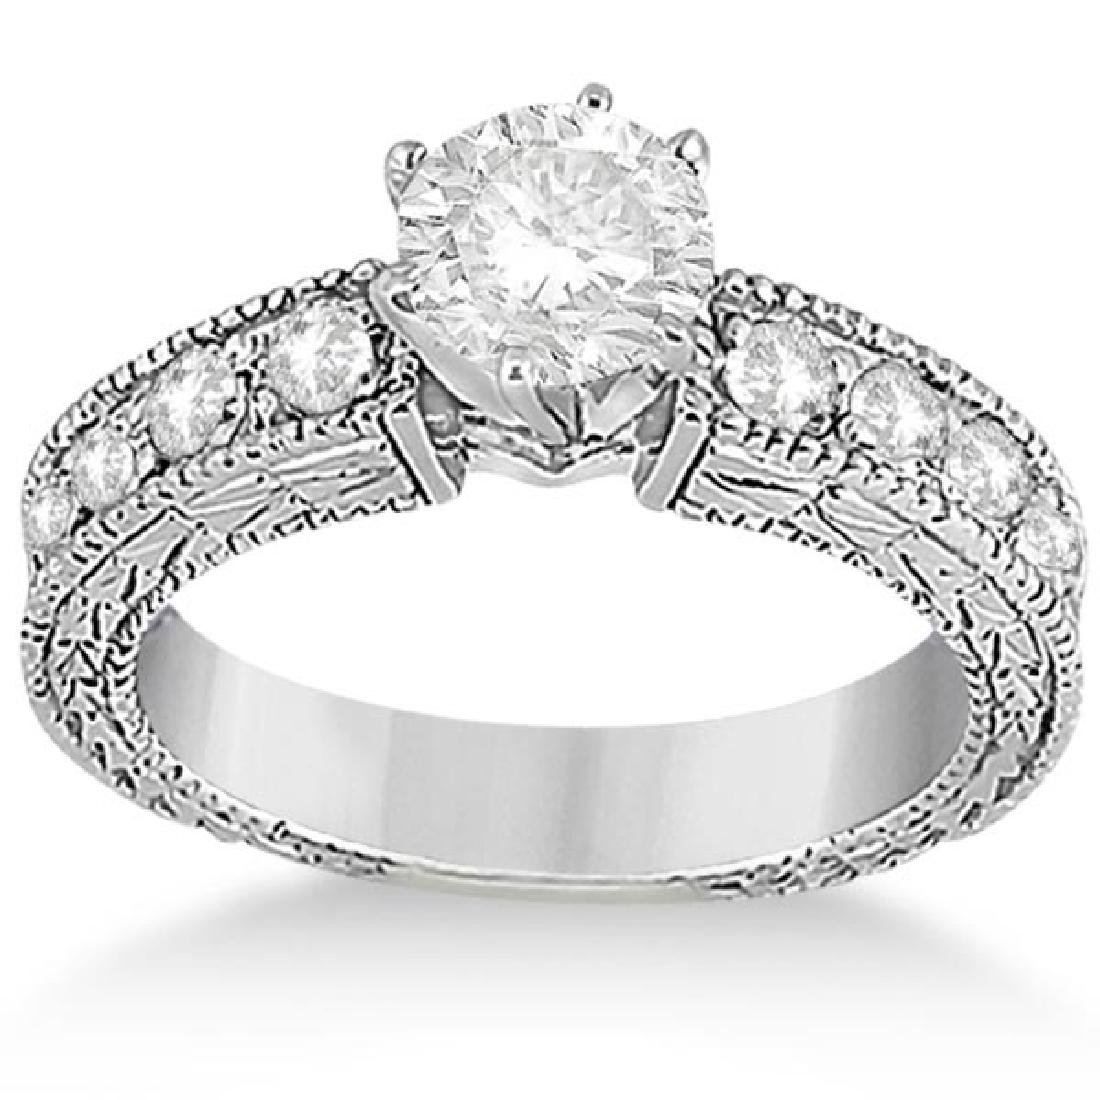 1.70ct Antique Style Diamond Engagement Ring 18K White